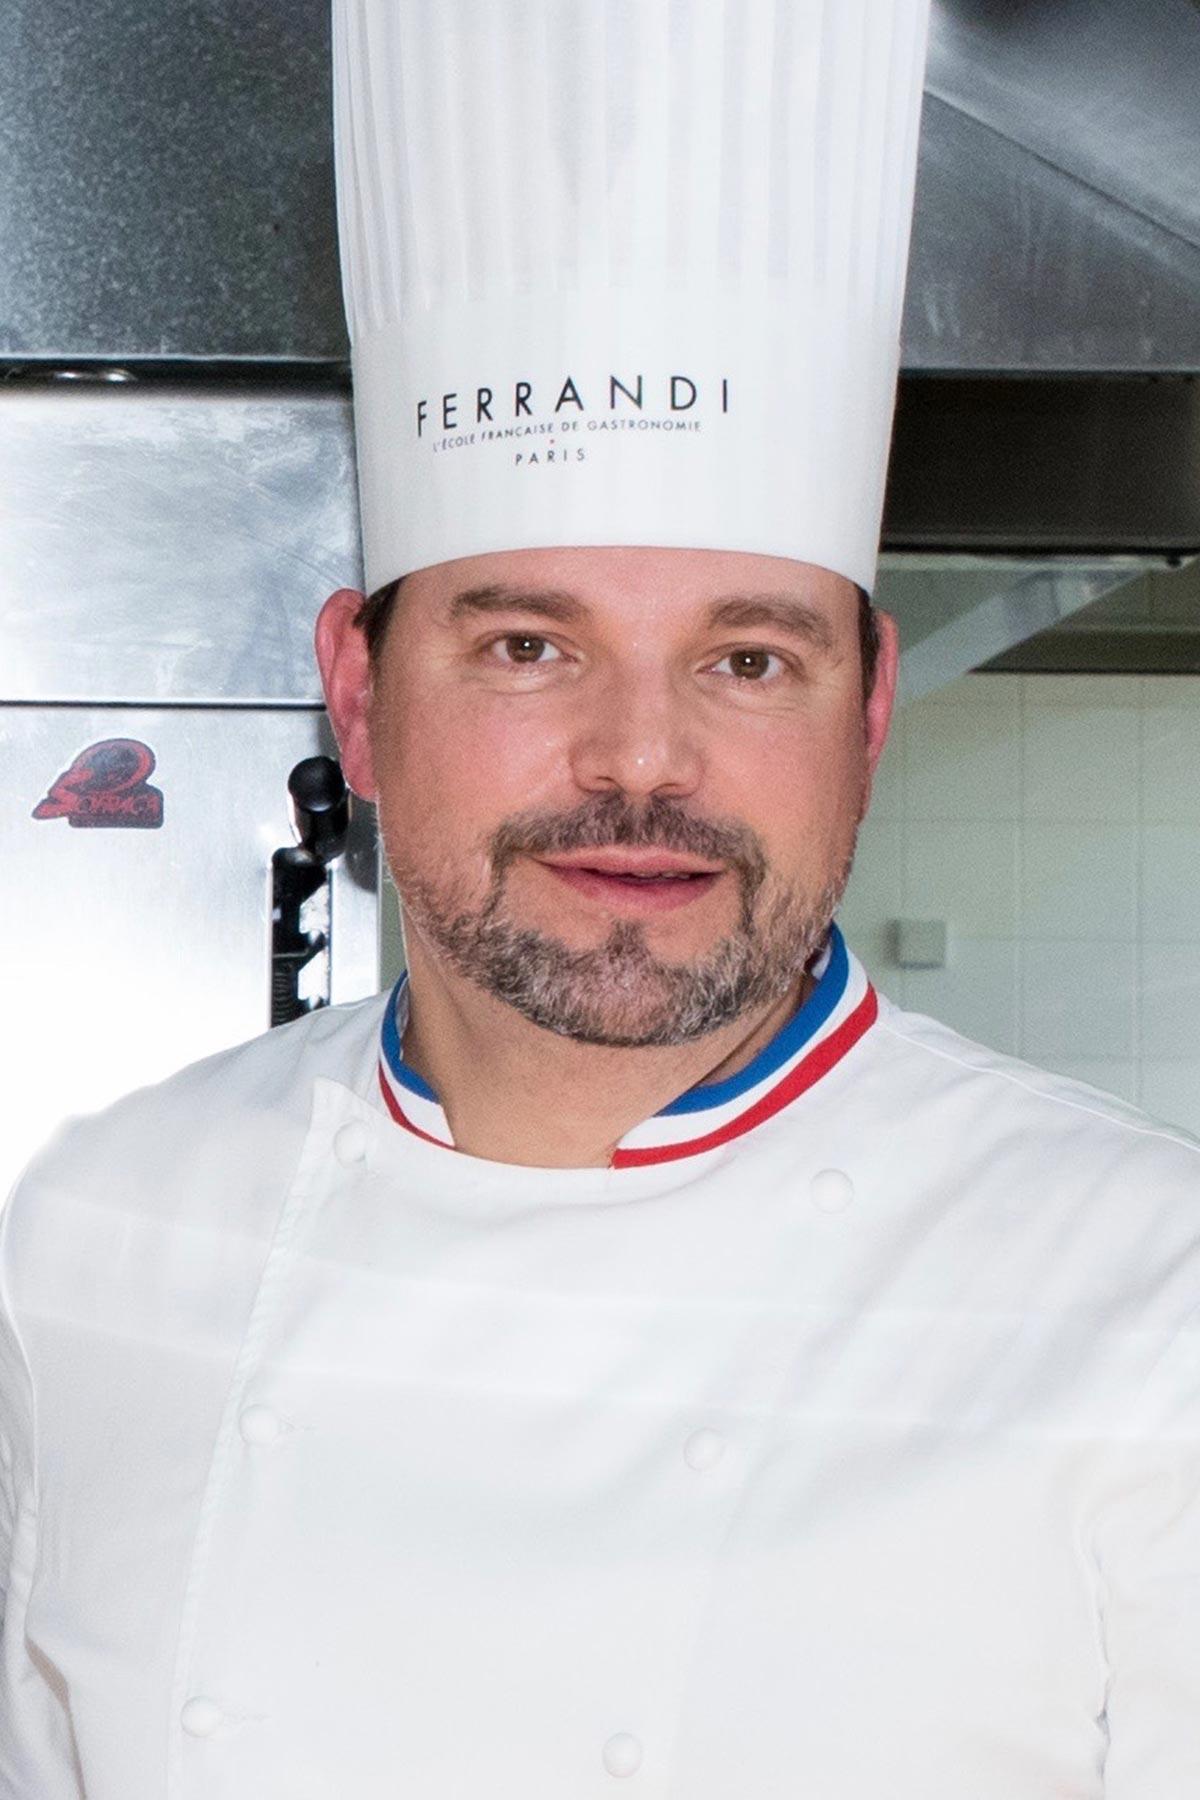 NICOLAS Benoît